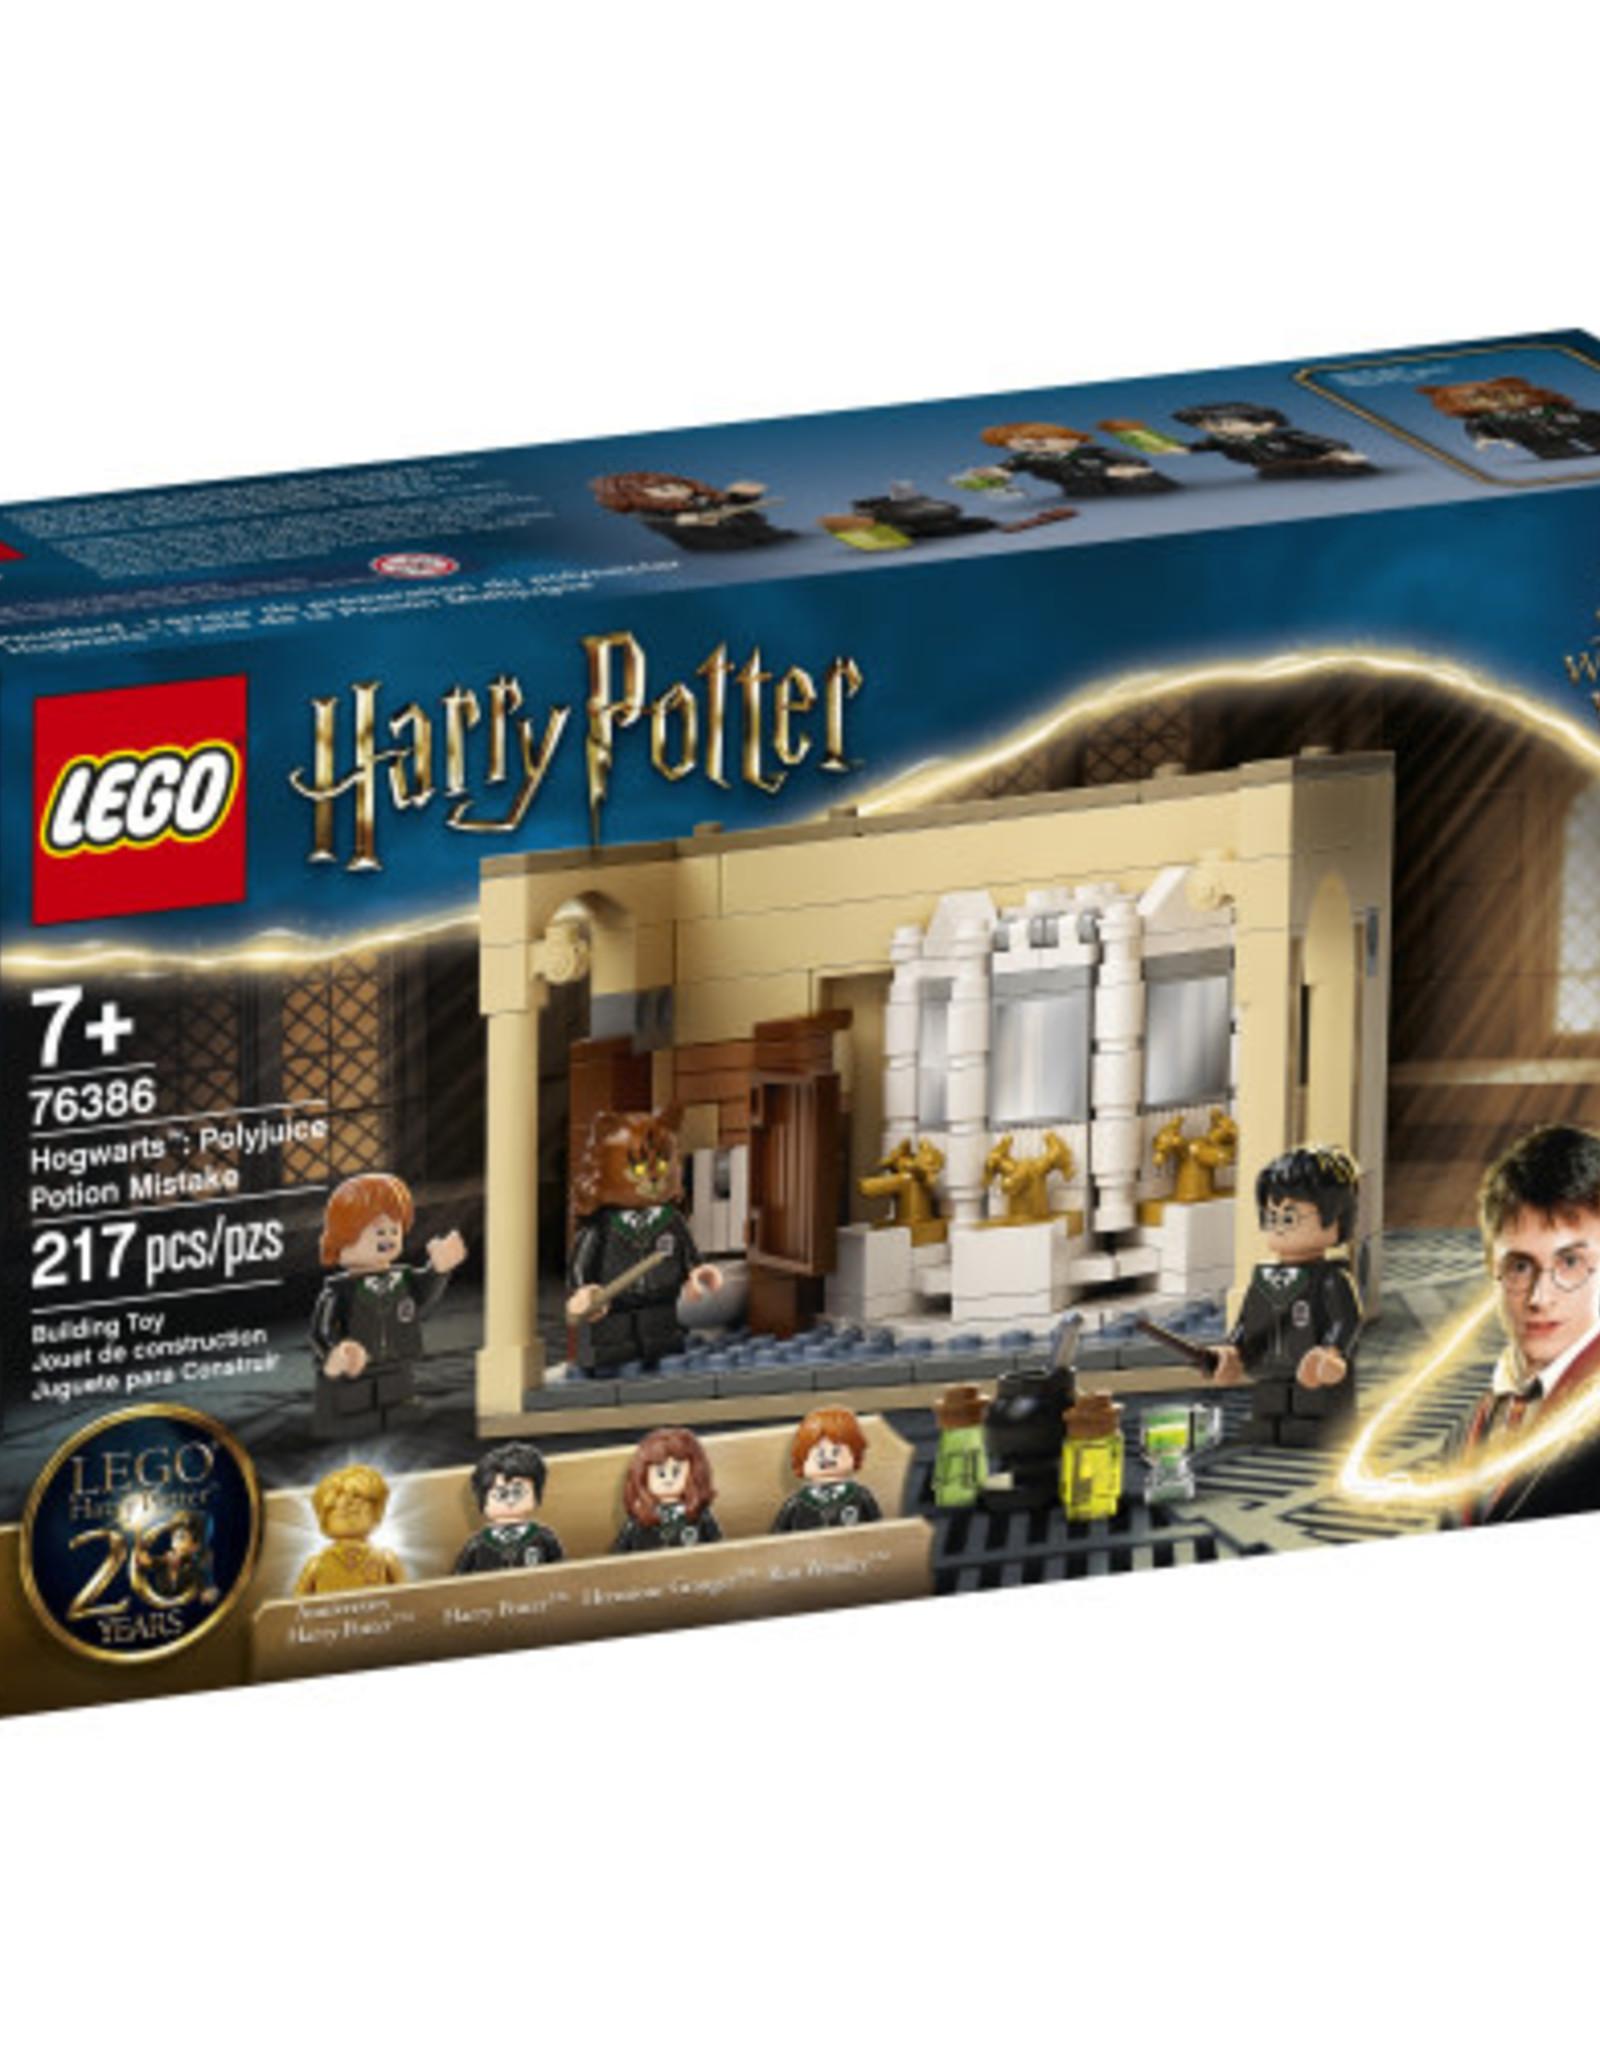 LEGO 76386 Hogwarts#: Polyjuice Potion Mistake V39